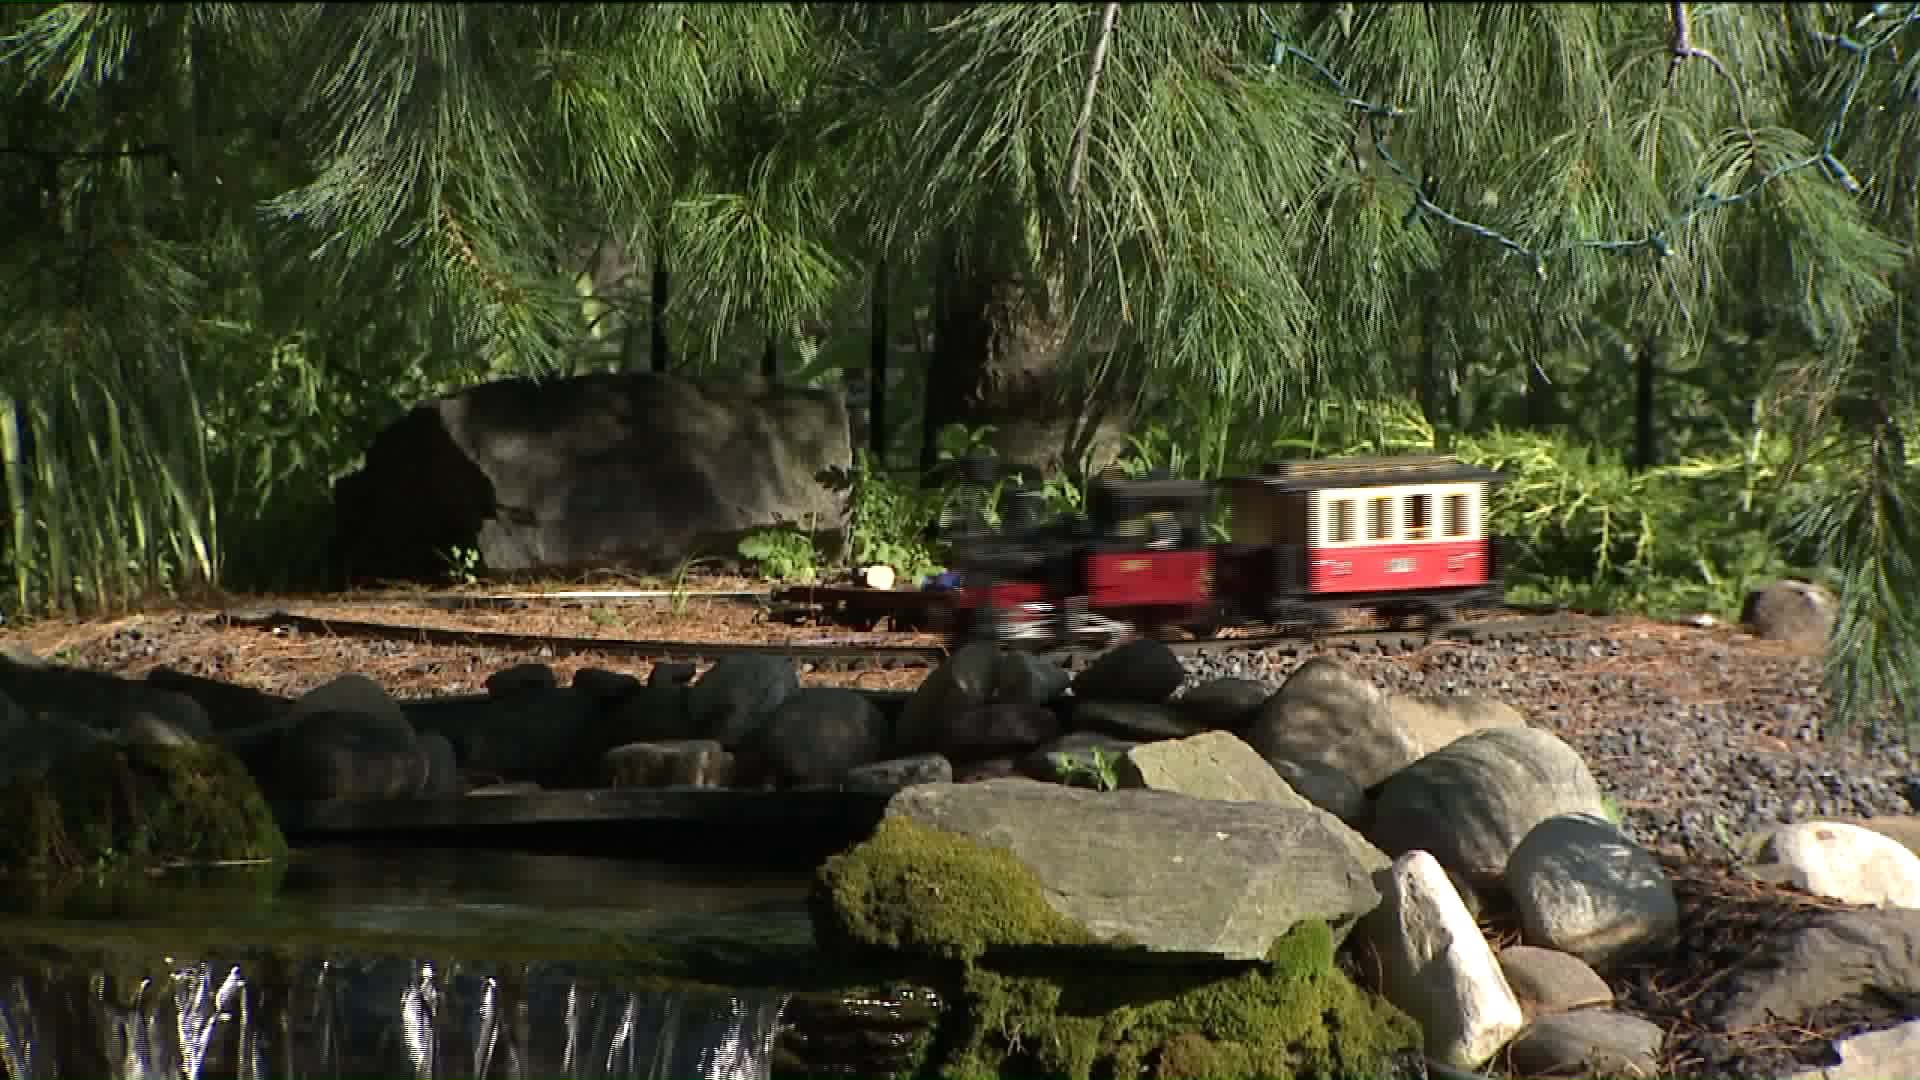 Talkback 16: The Backyard Train Goes National! | wnep.com